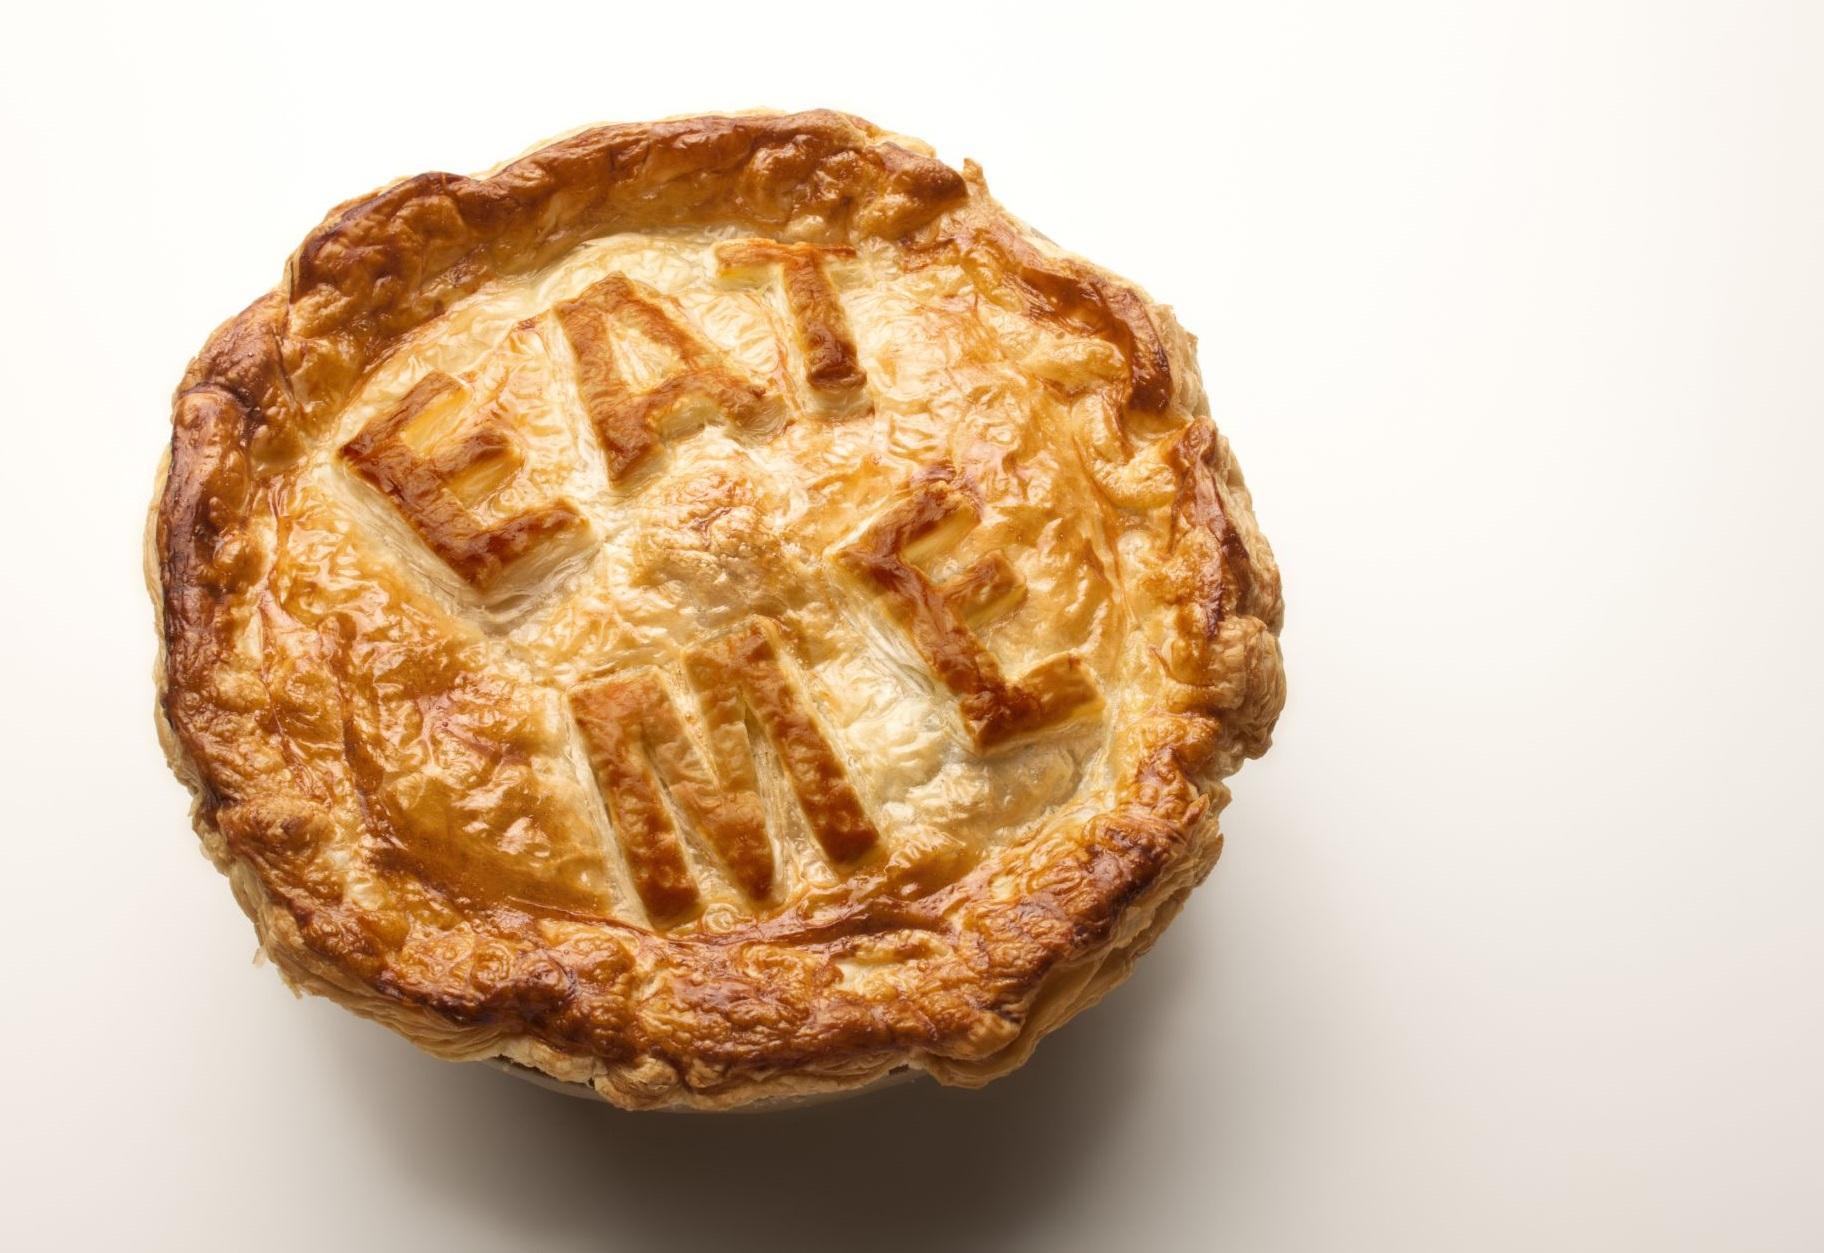 British Pie Week – 7 vegetarian pie recipes to celebrate